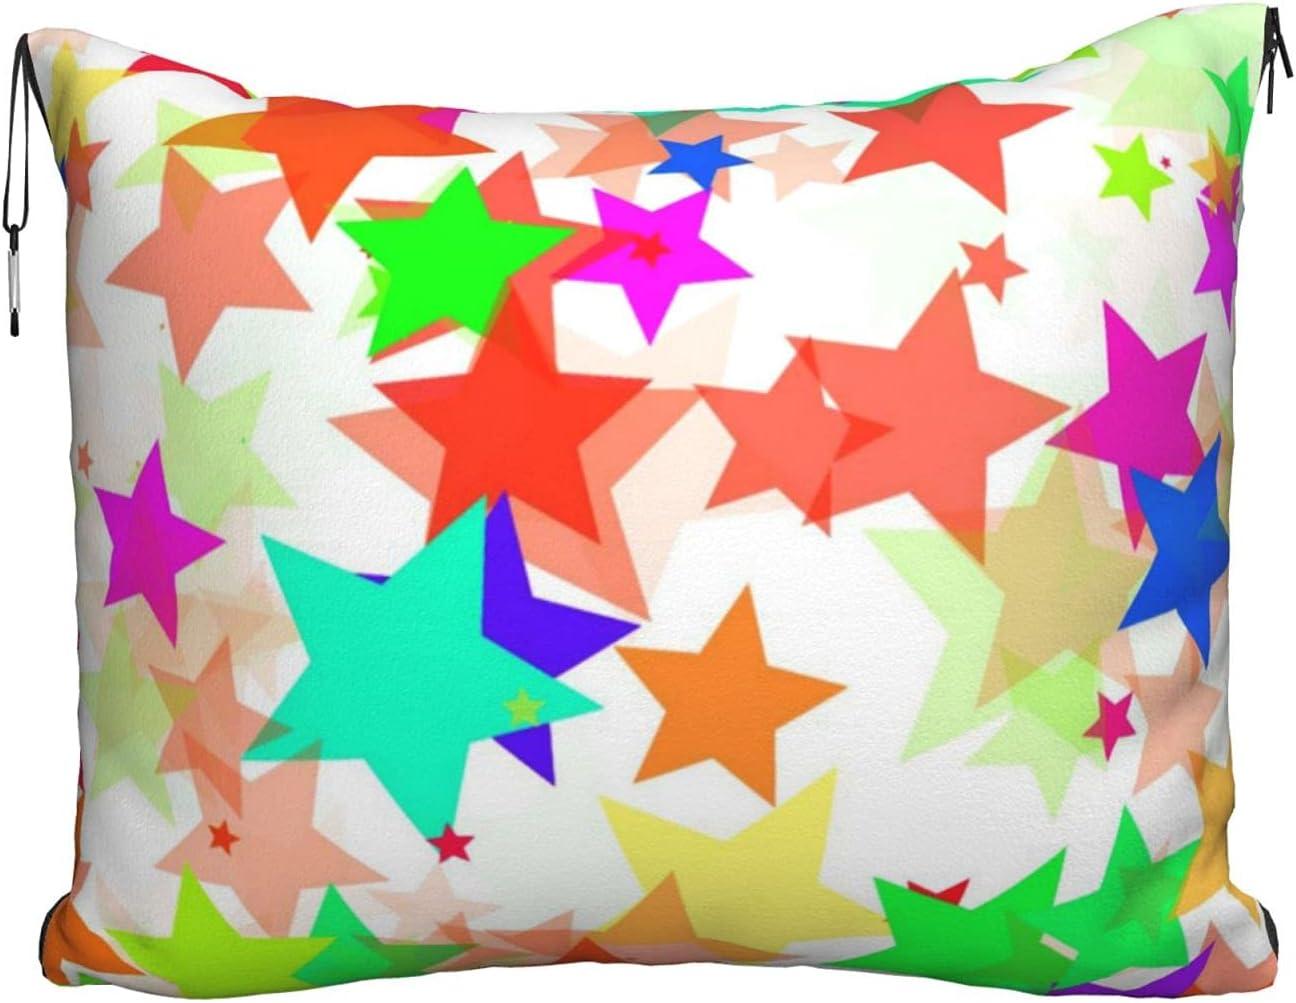 Mescchskcolorful Oakland Mall Star Print Travel Max 63% OFF Blanket Combo Pillow P